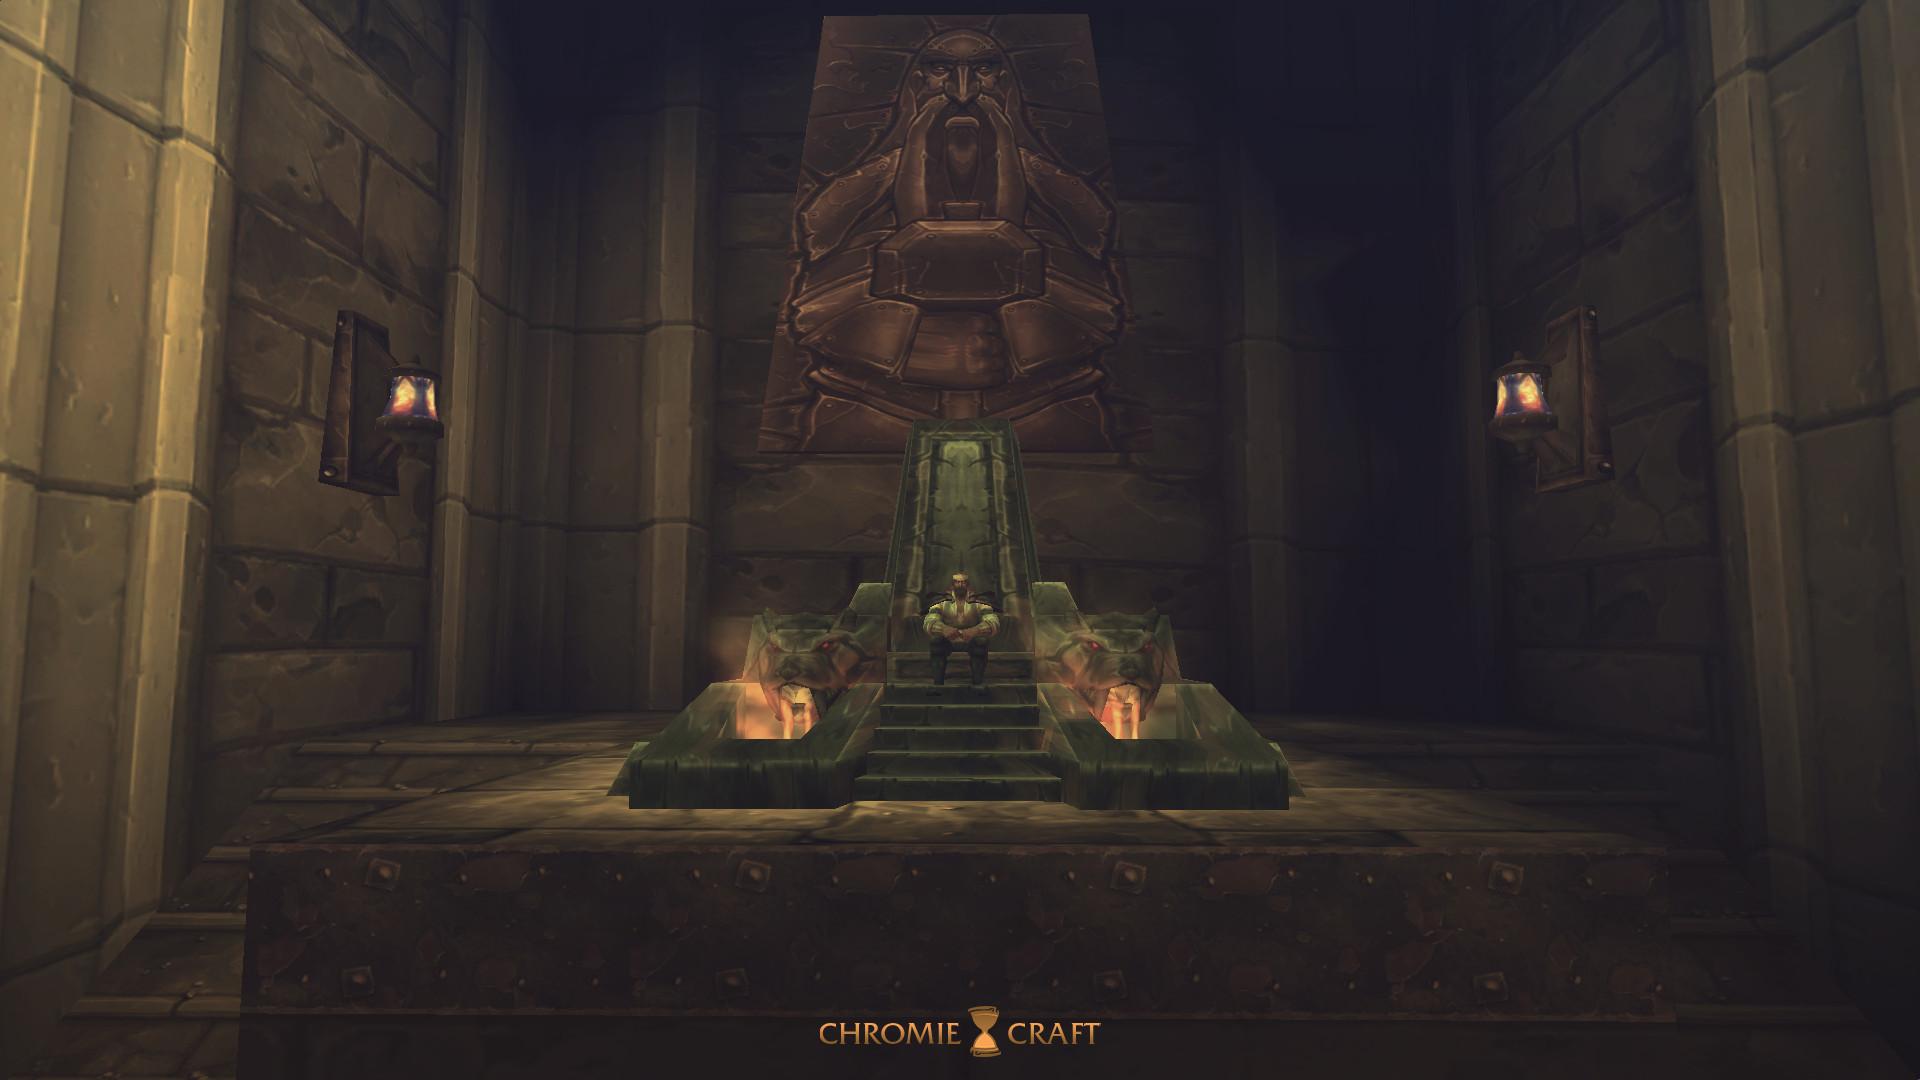 ChromieCraft artwork by shinzo